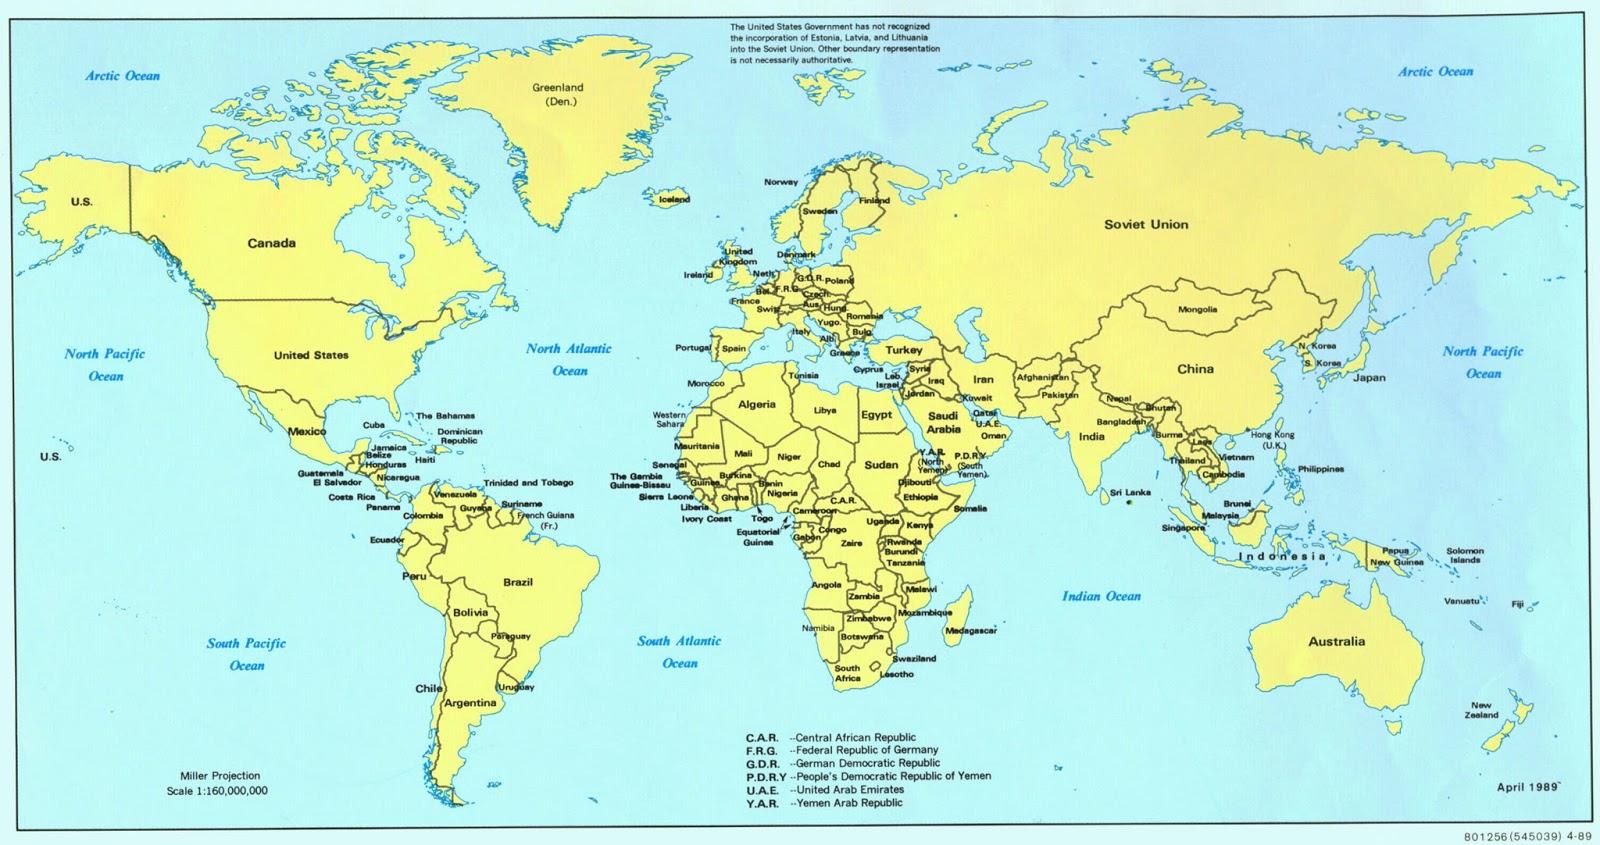 Gundhramns hammer world maps political tools world maps political tools gumiabroncs Gallery